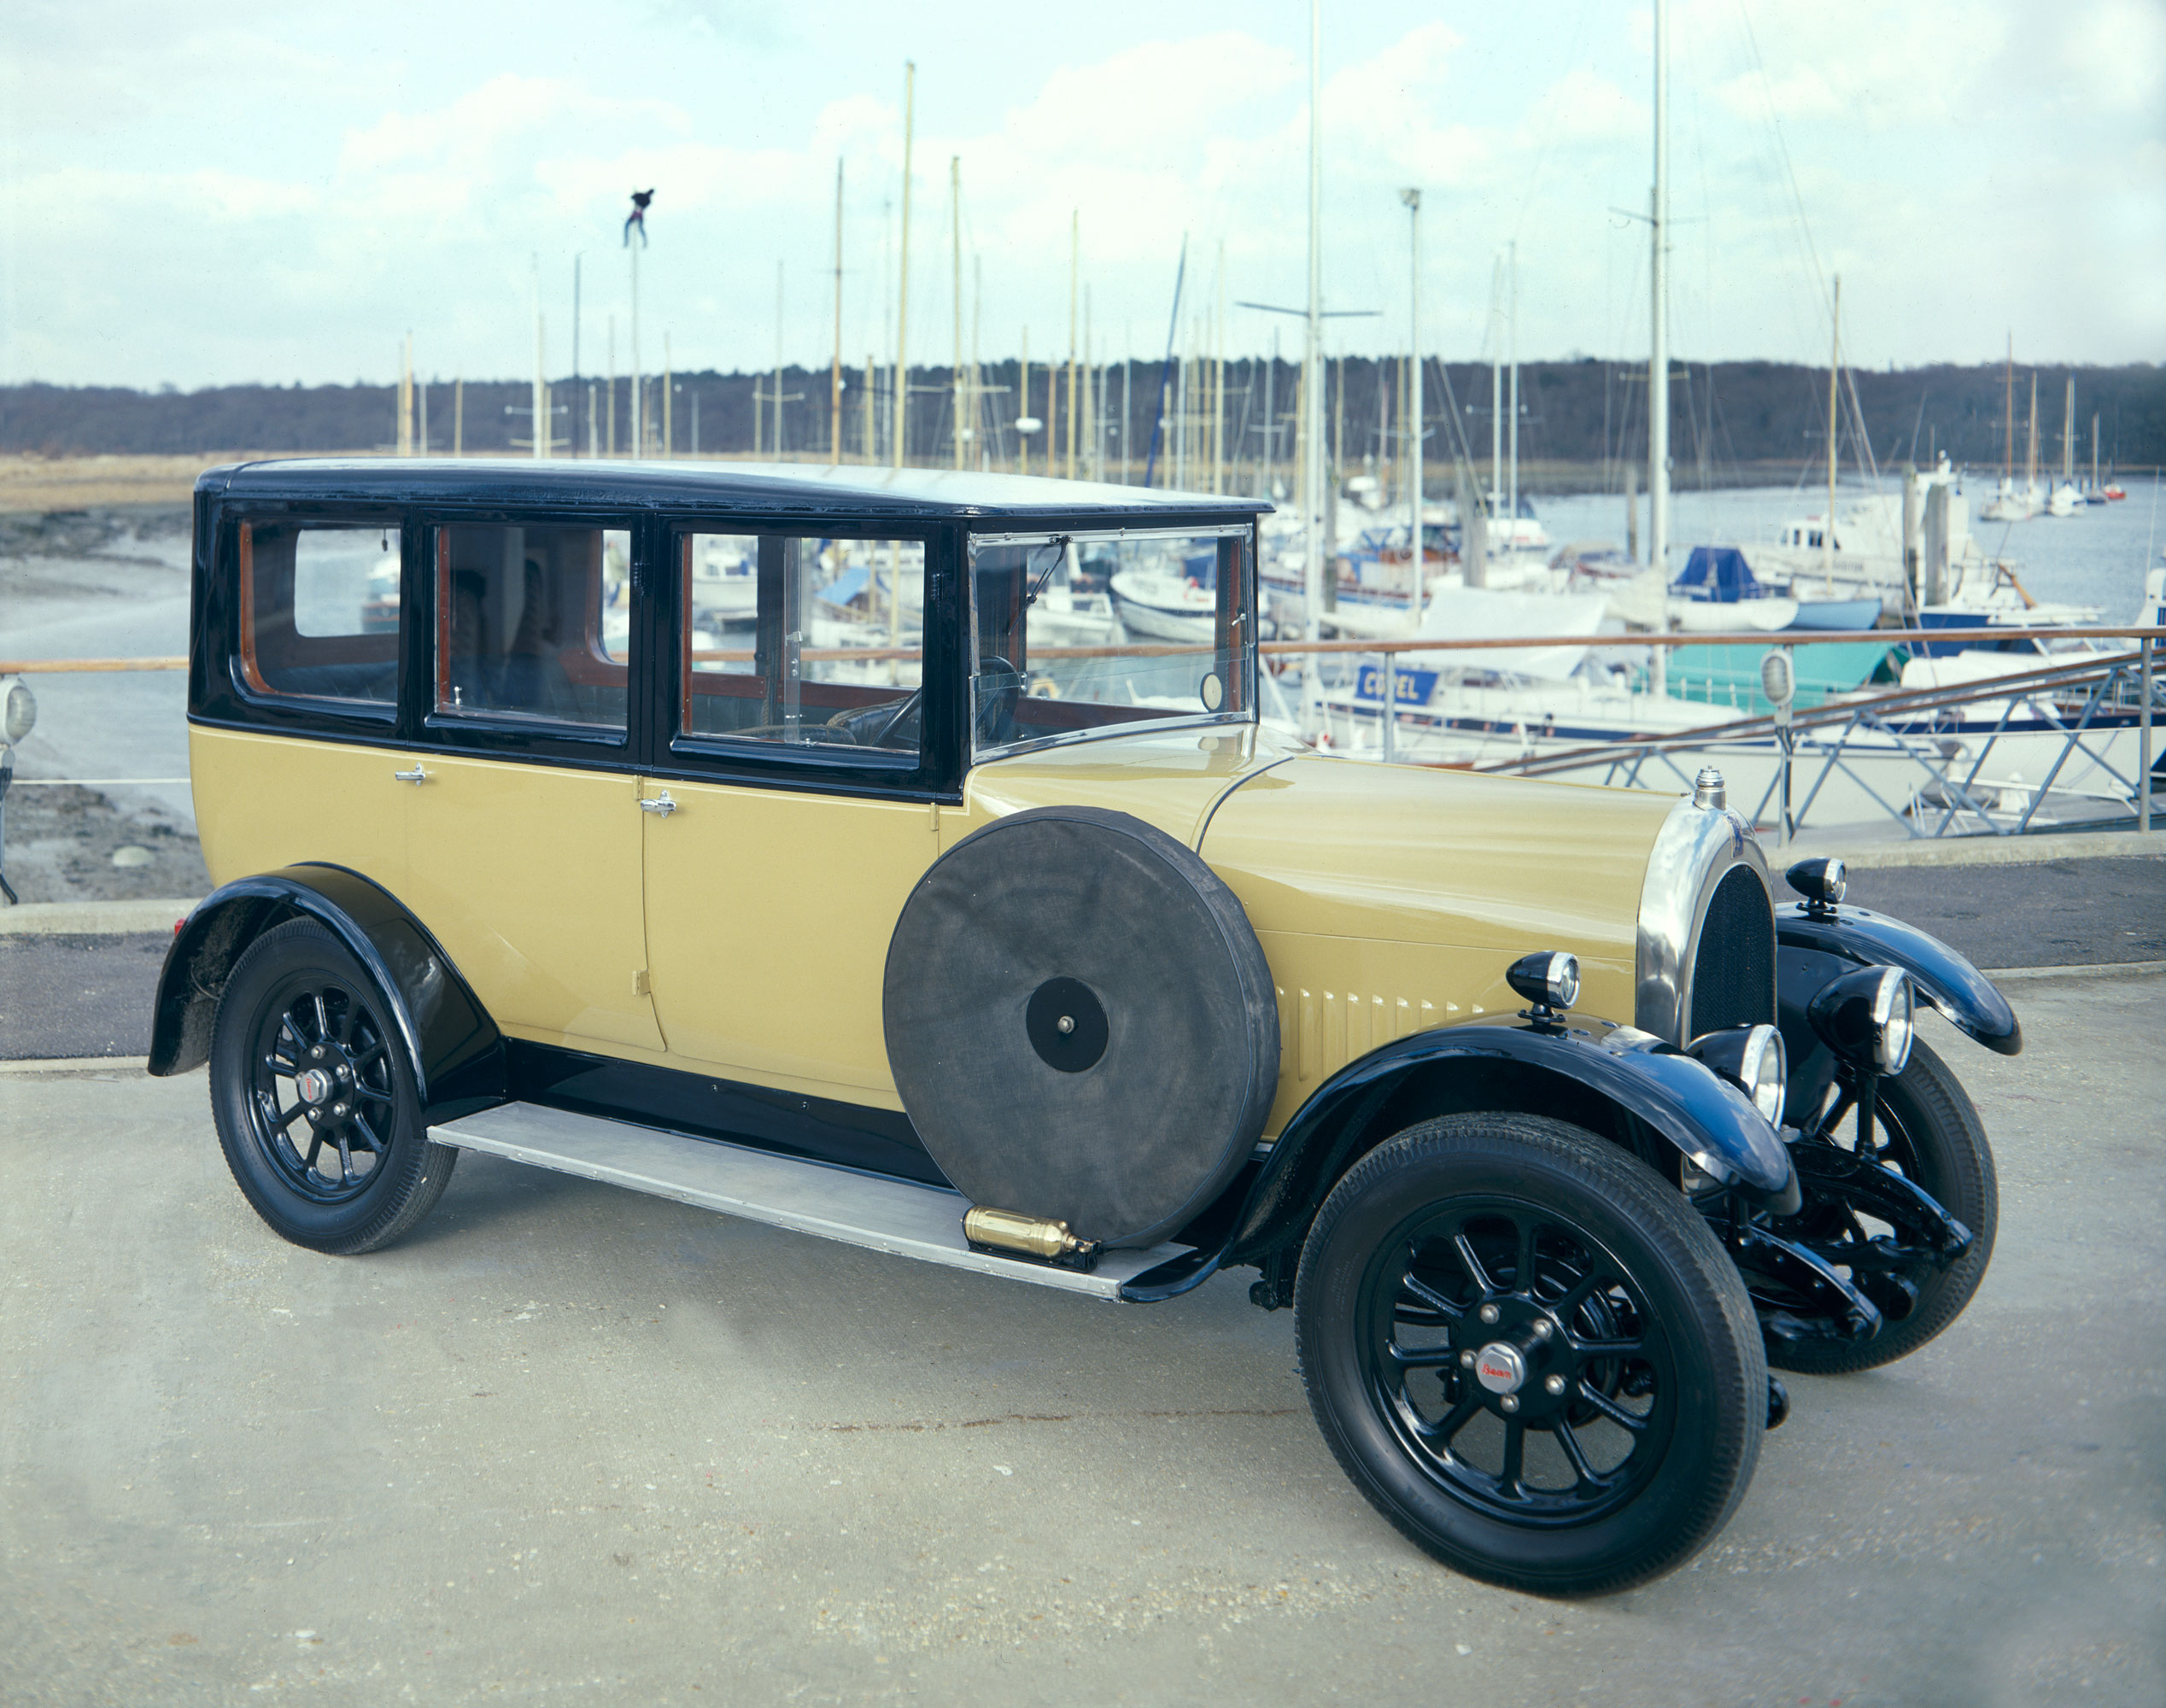 A 1928 Bean Short 14 vintage car at the Buckler's Hard yacht harbour